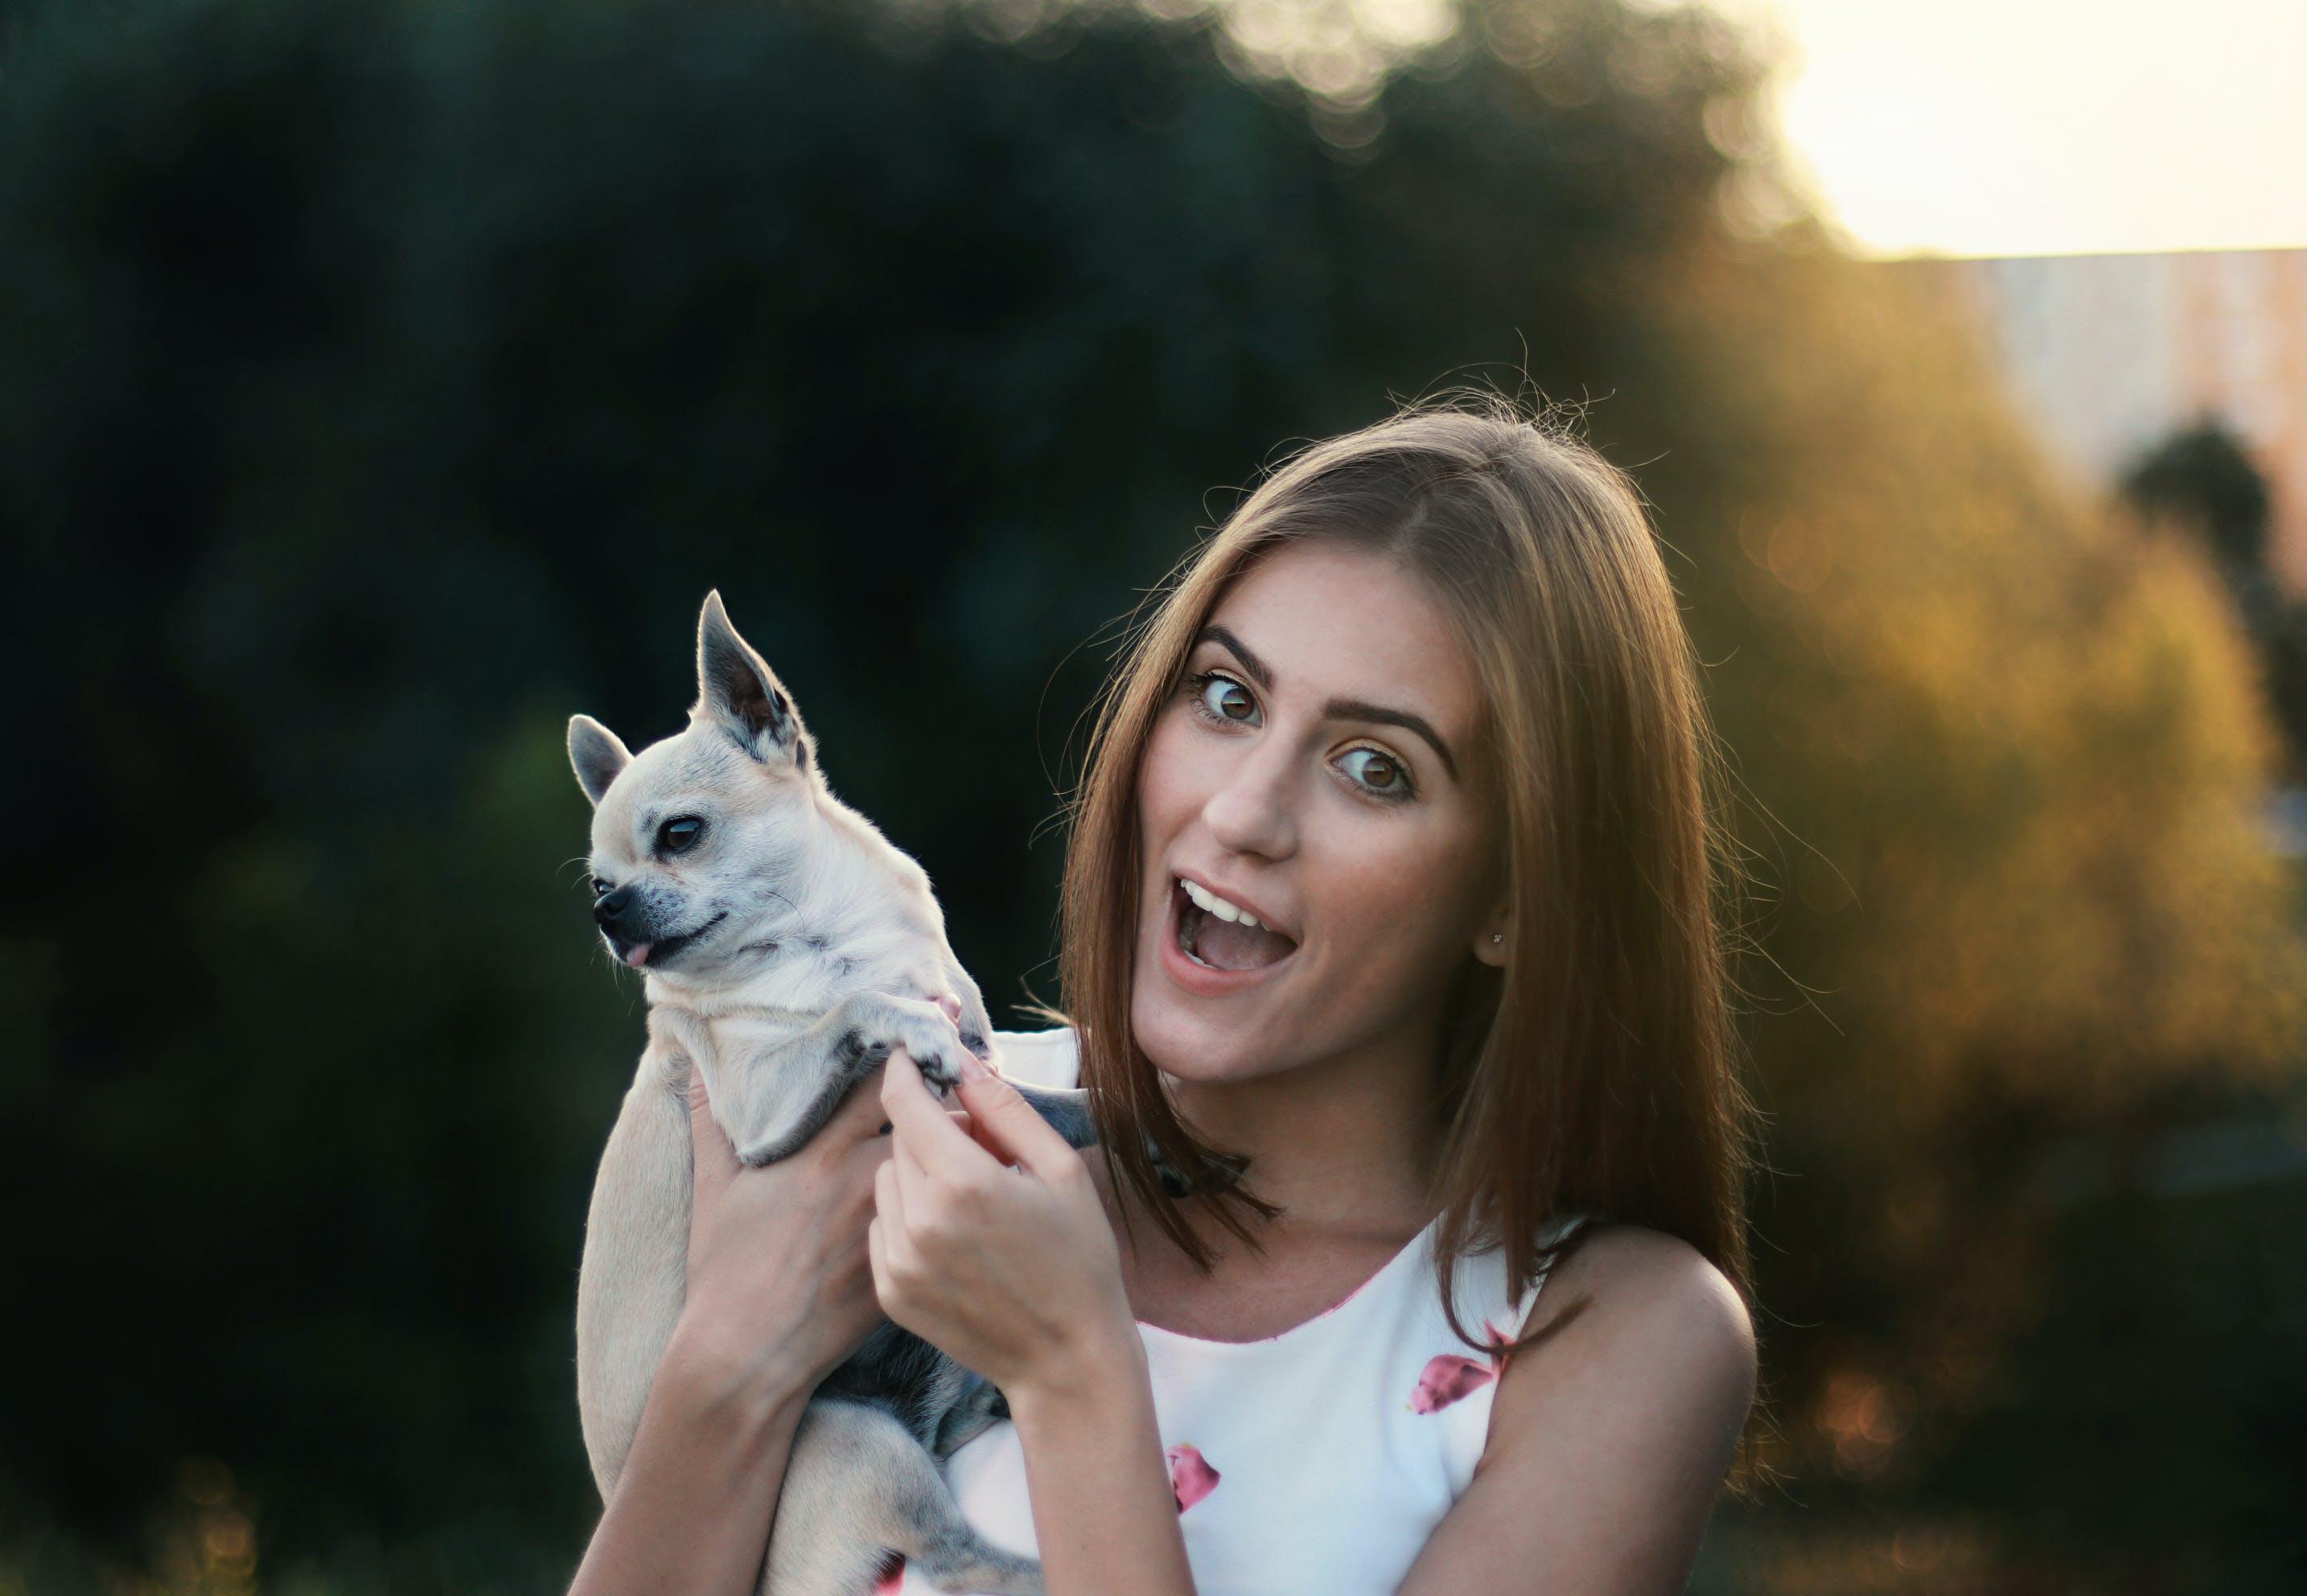 Free stock photo of animal lover, beautiful girl, blurred background, dog